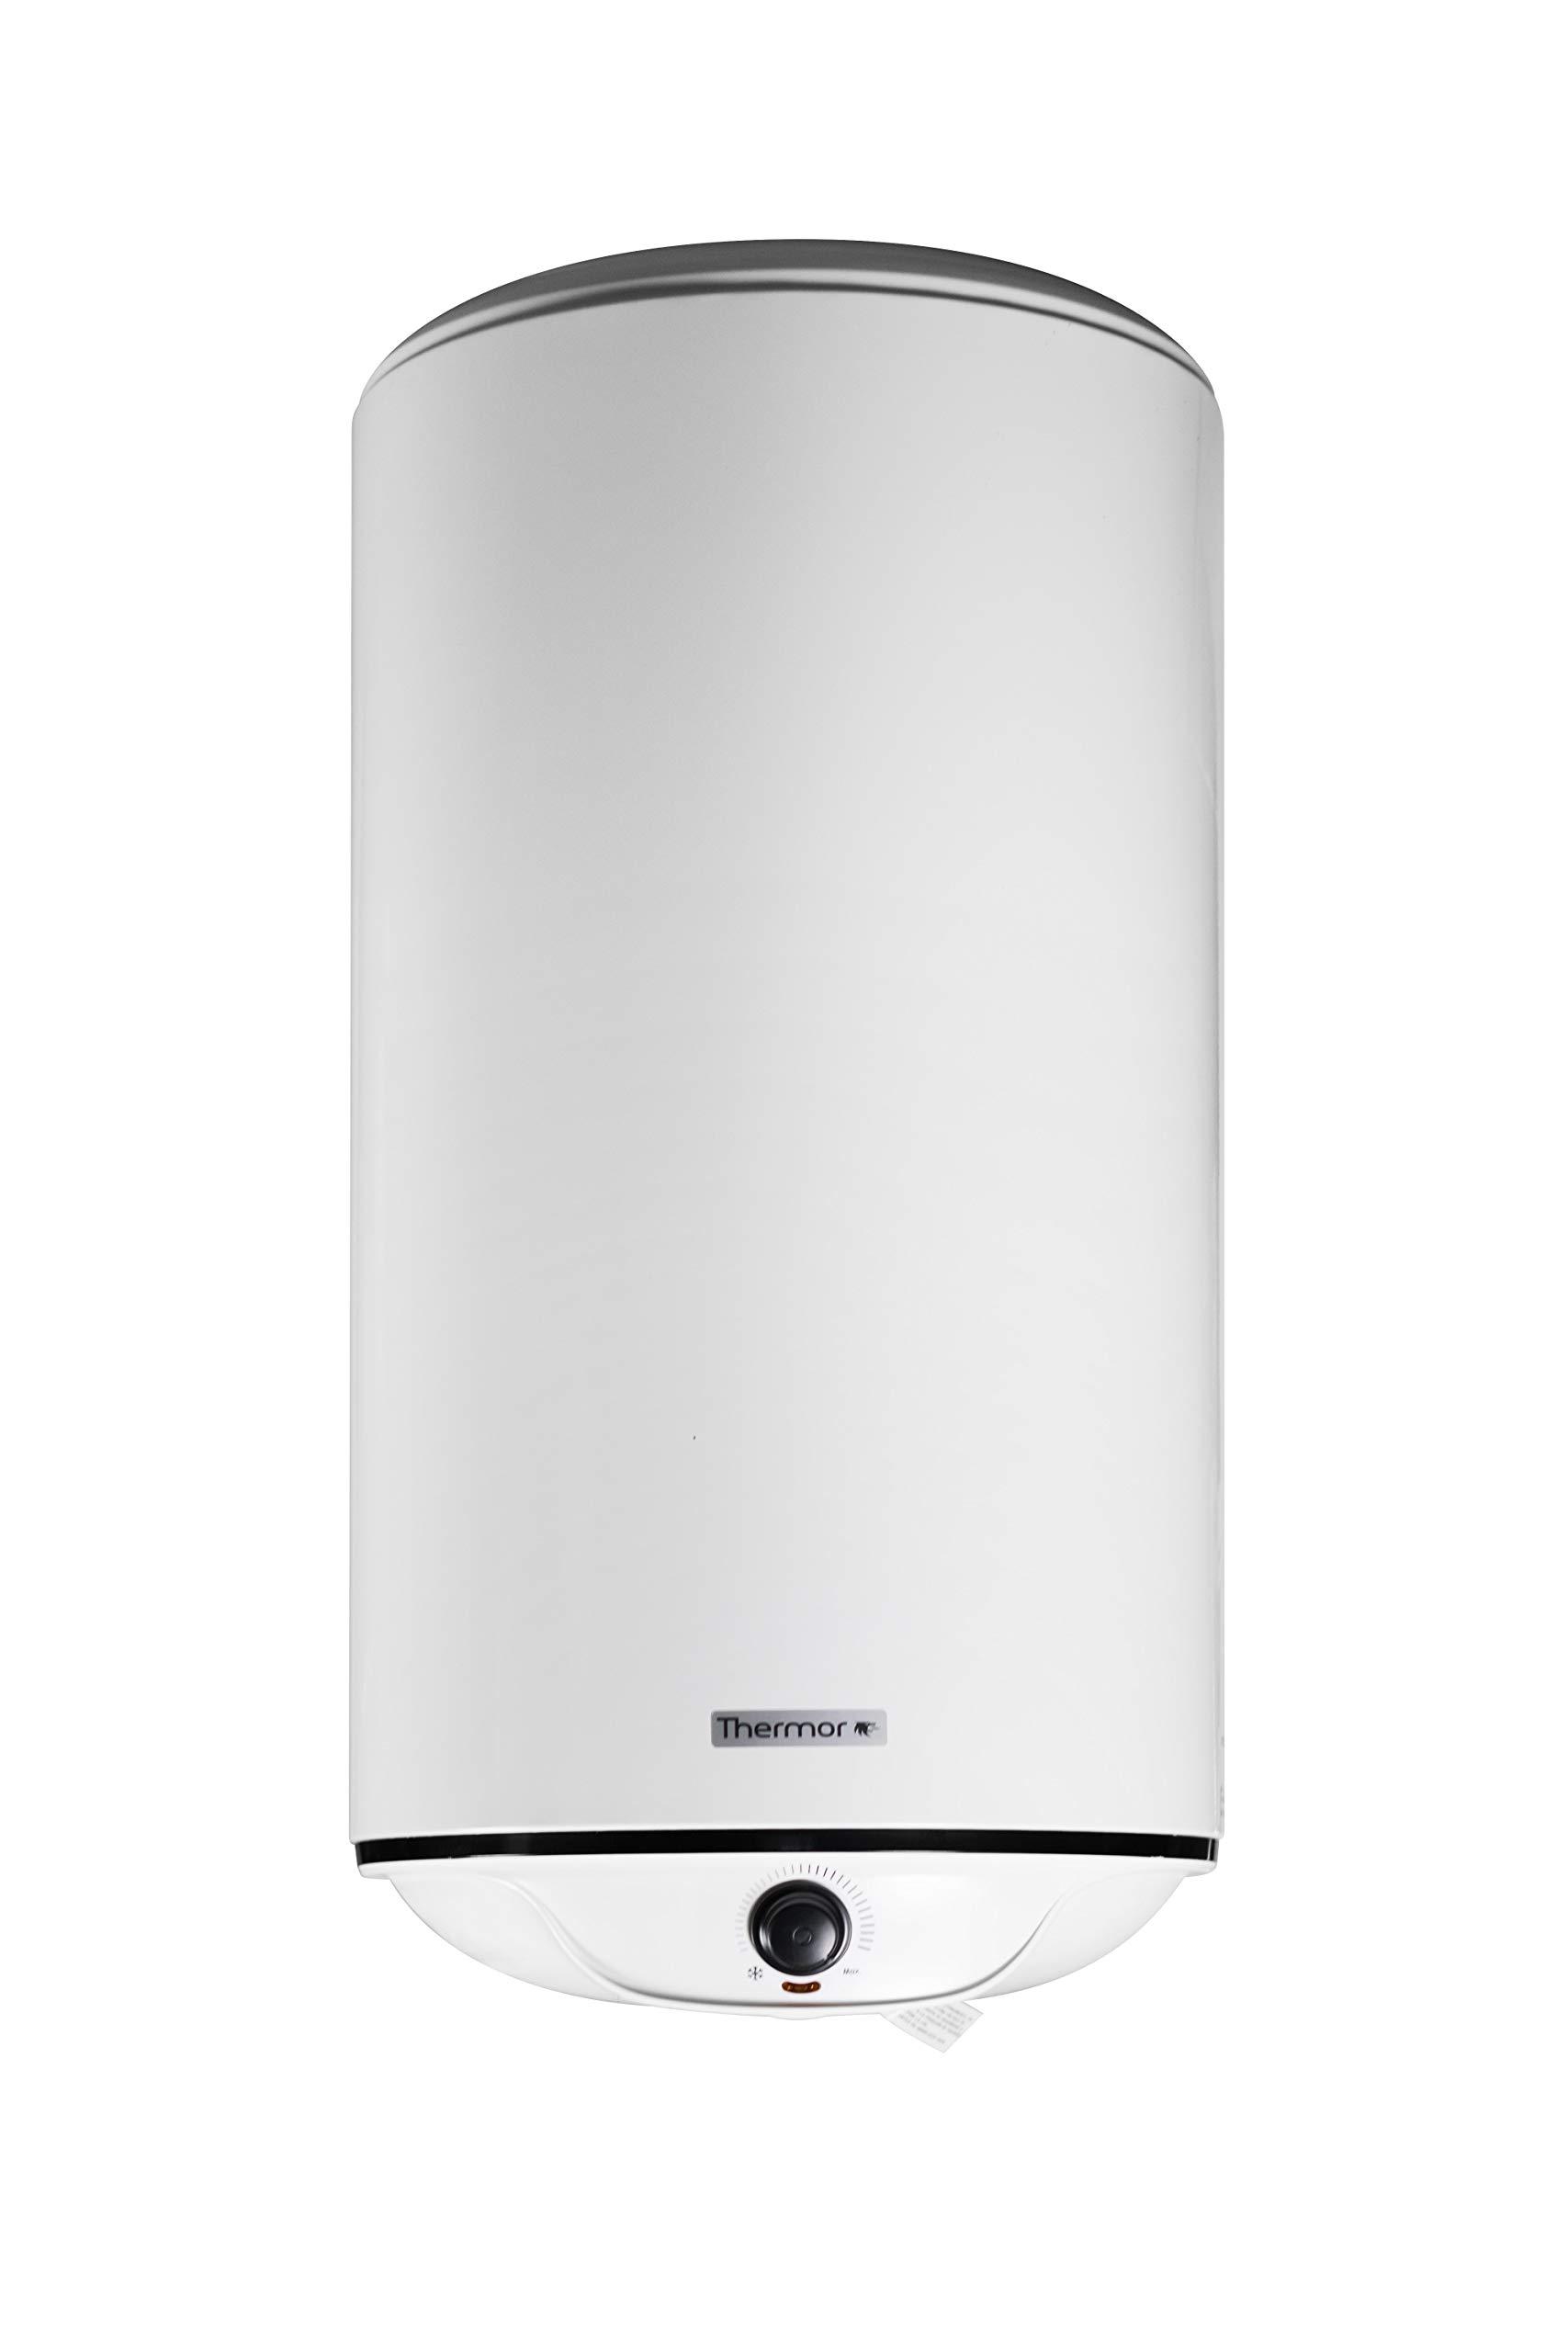 Thermor Groupe Atlantic Termo Electrico 80 litros Slim | Calentador de Agua Vertical, Serie Premium Ceramics…